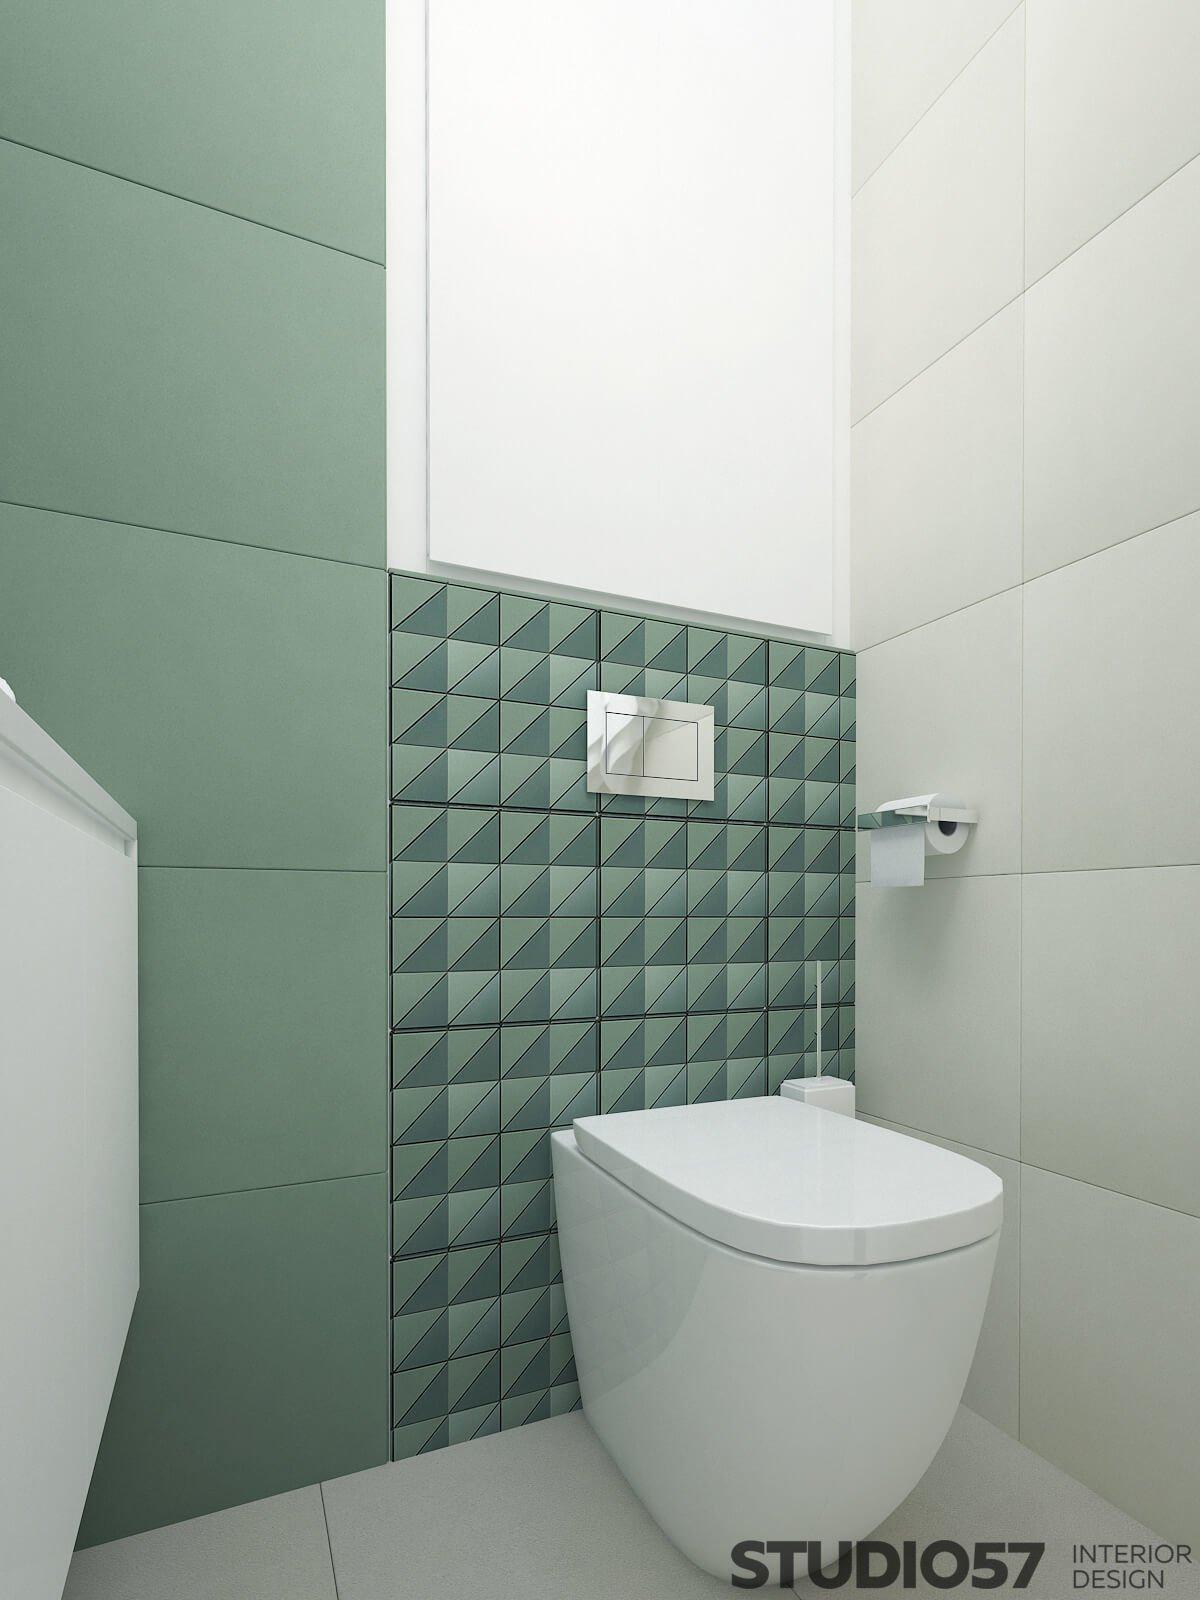 Draft bathroom in dark green color